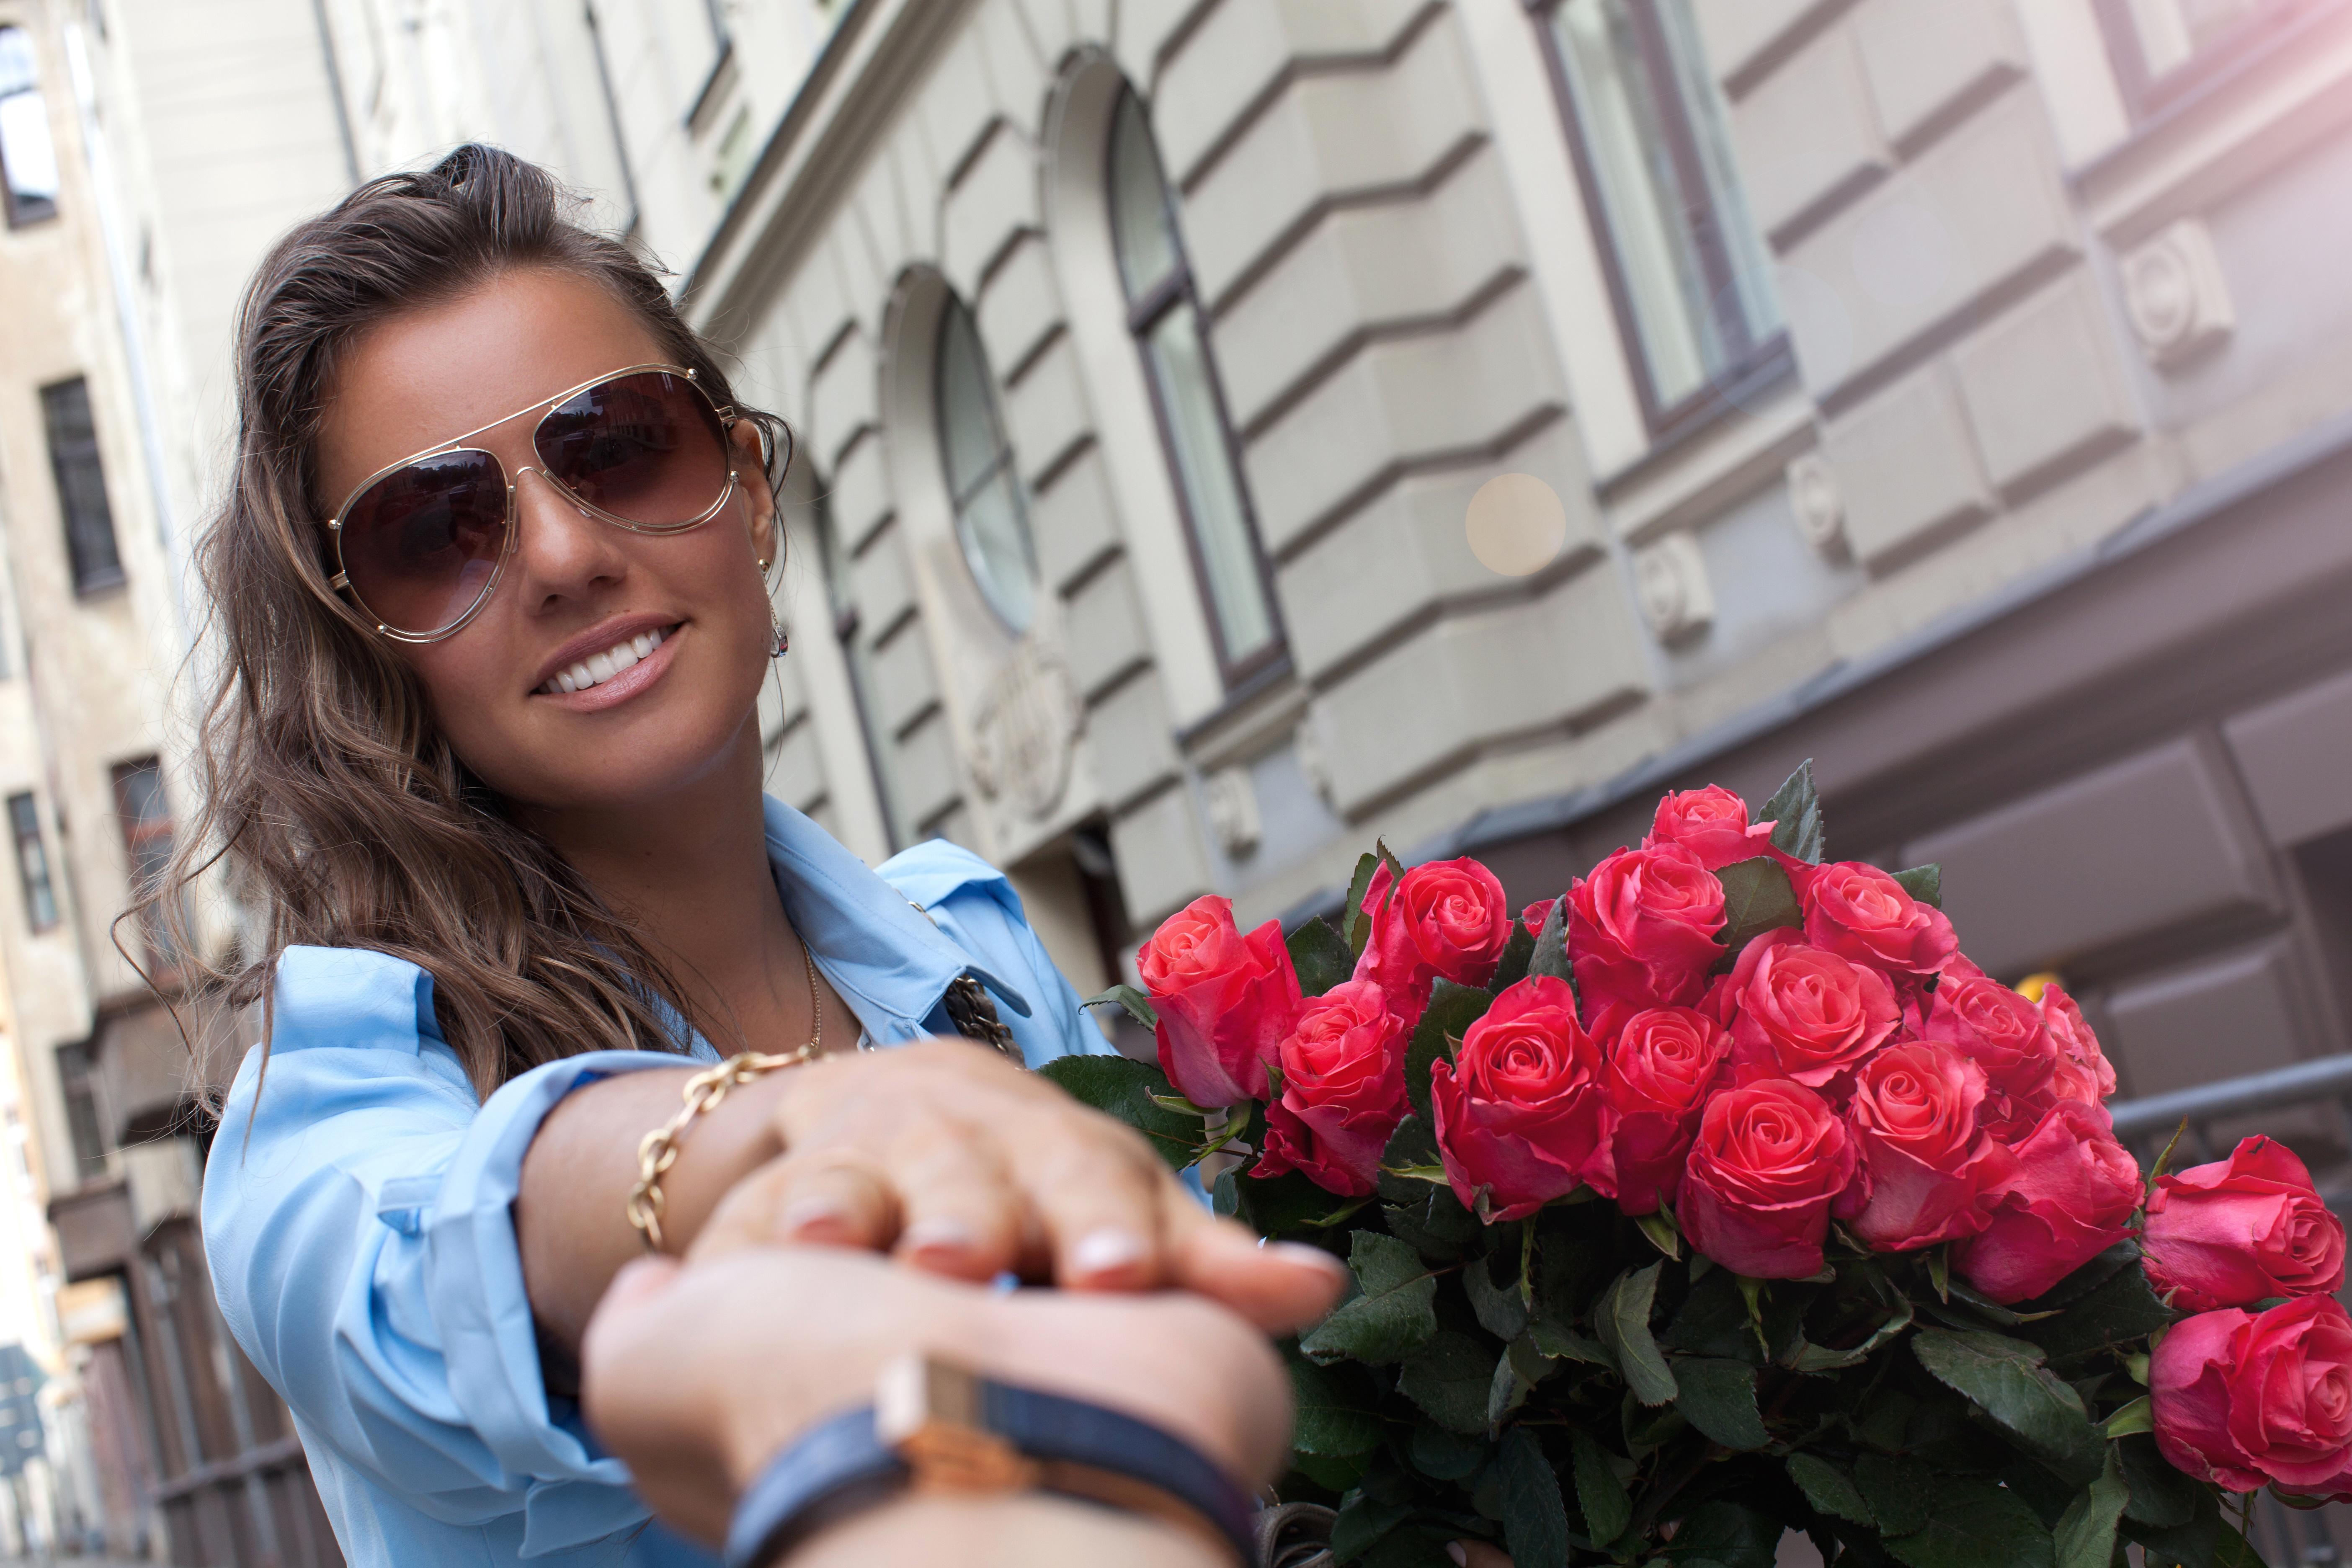 Девушка с большим букетом роз картинки